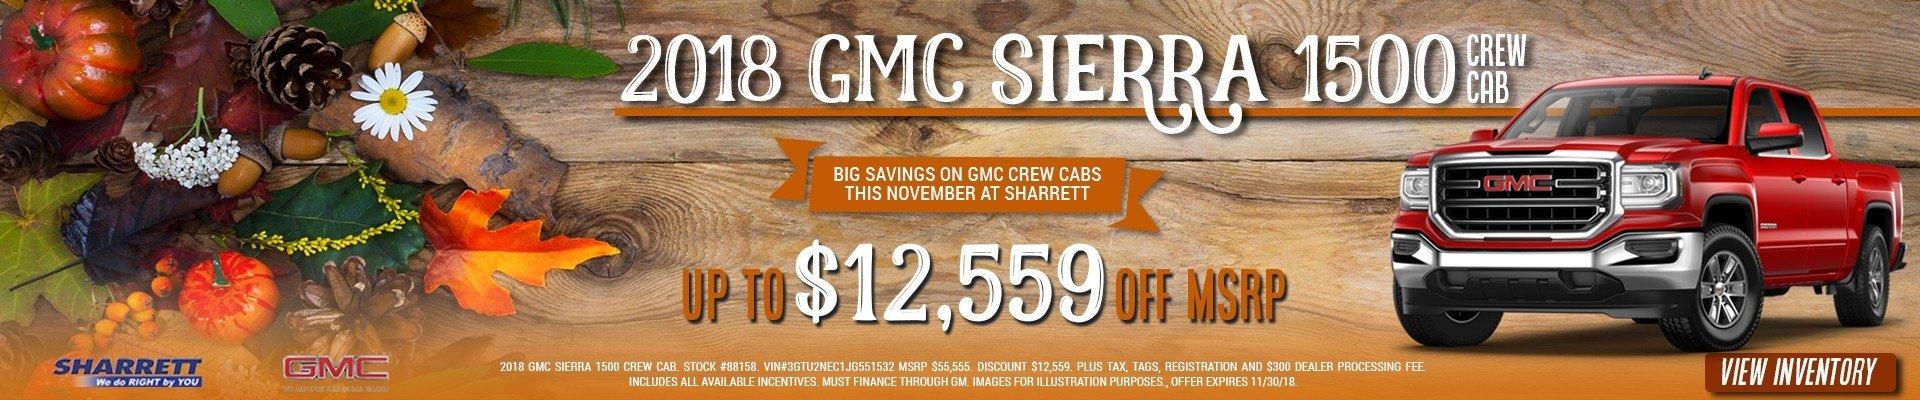 Get up to $12,559 off a new 2018 GMC Sierra 1500 Crew Cab at Sharrett Buick GMC